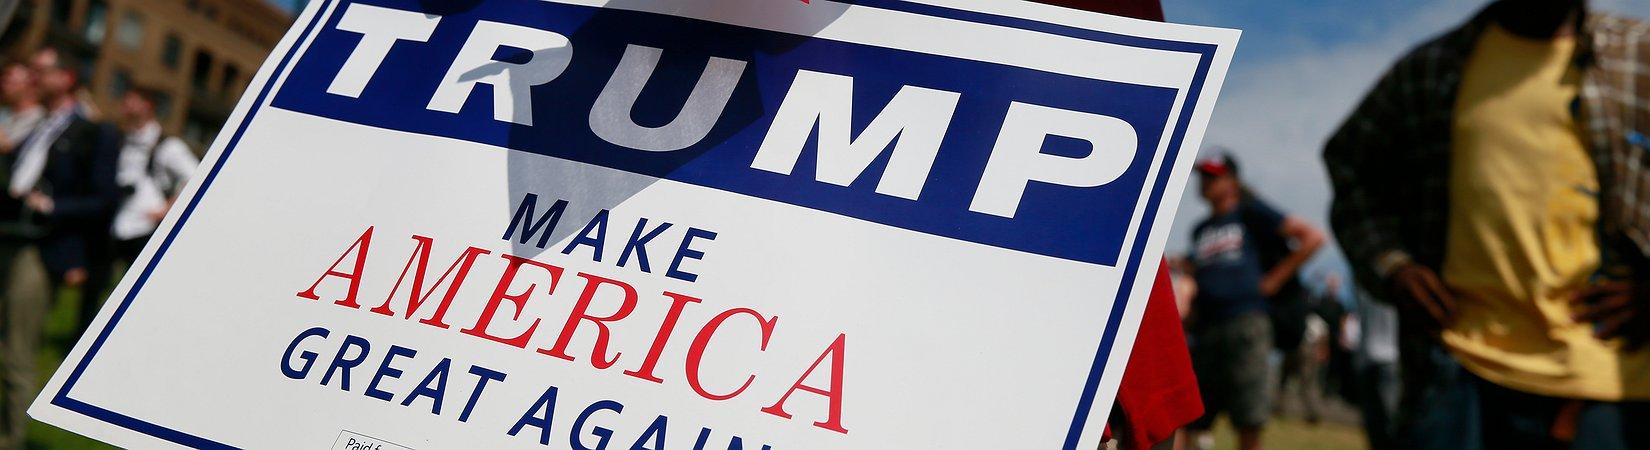 Ermittlung gegen Trumps Stiftung begonnen